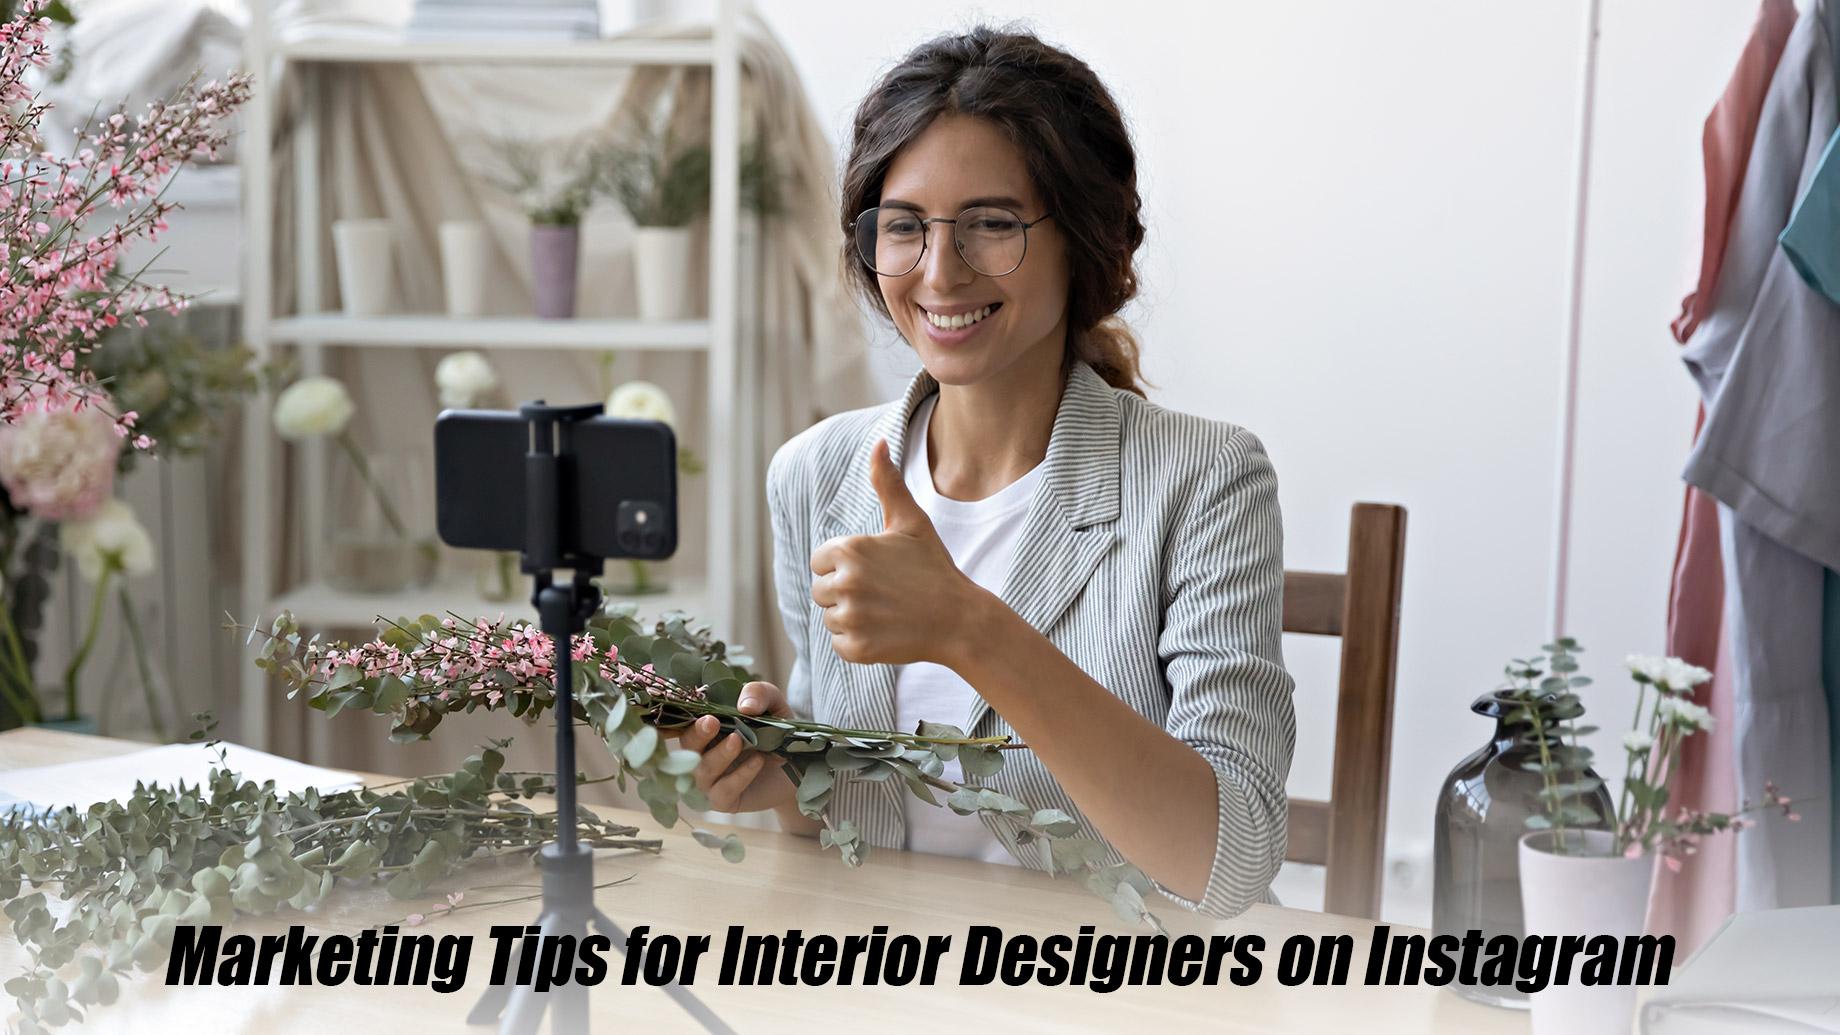 Marketing Tips for Interior Designers on Instagram